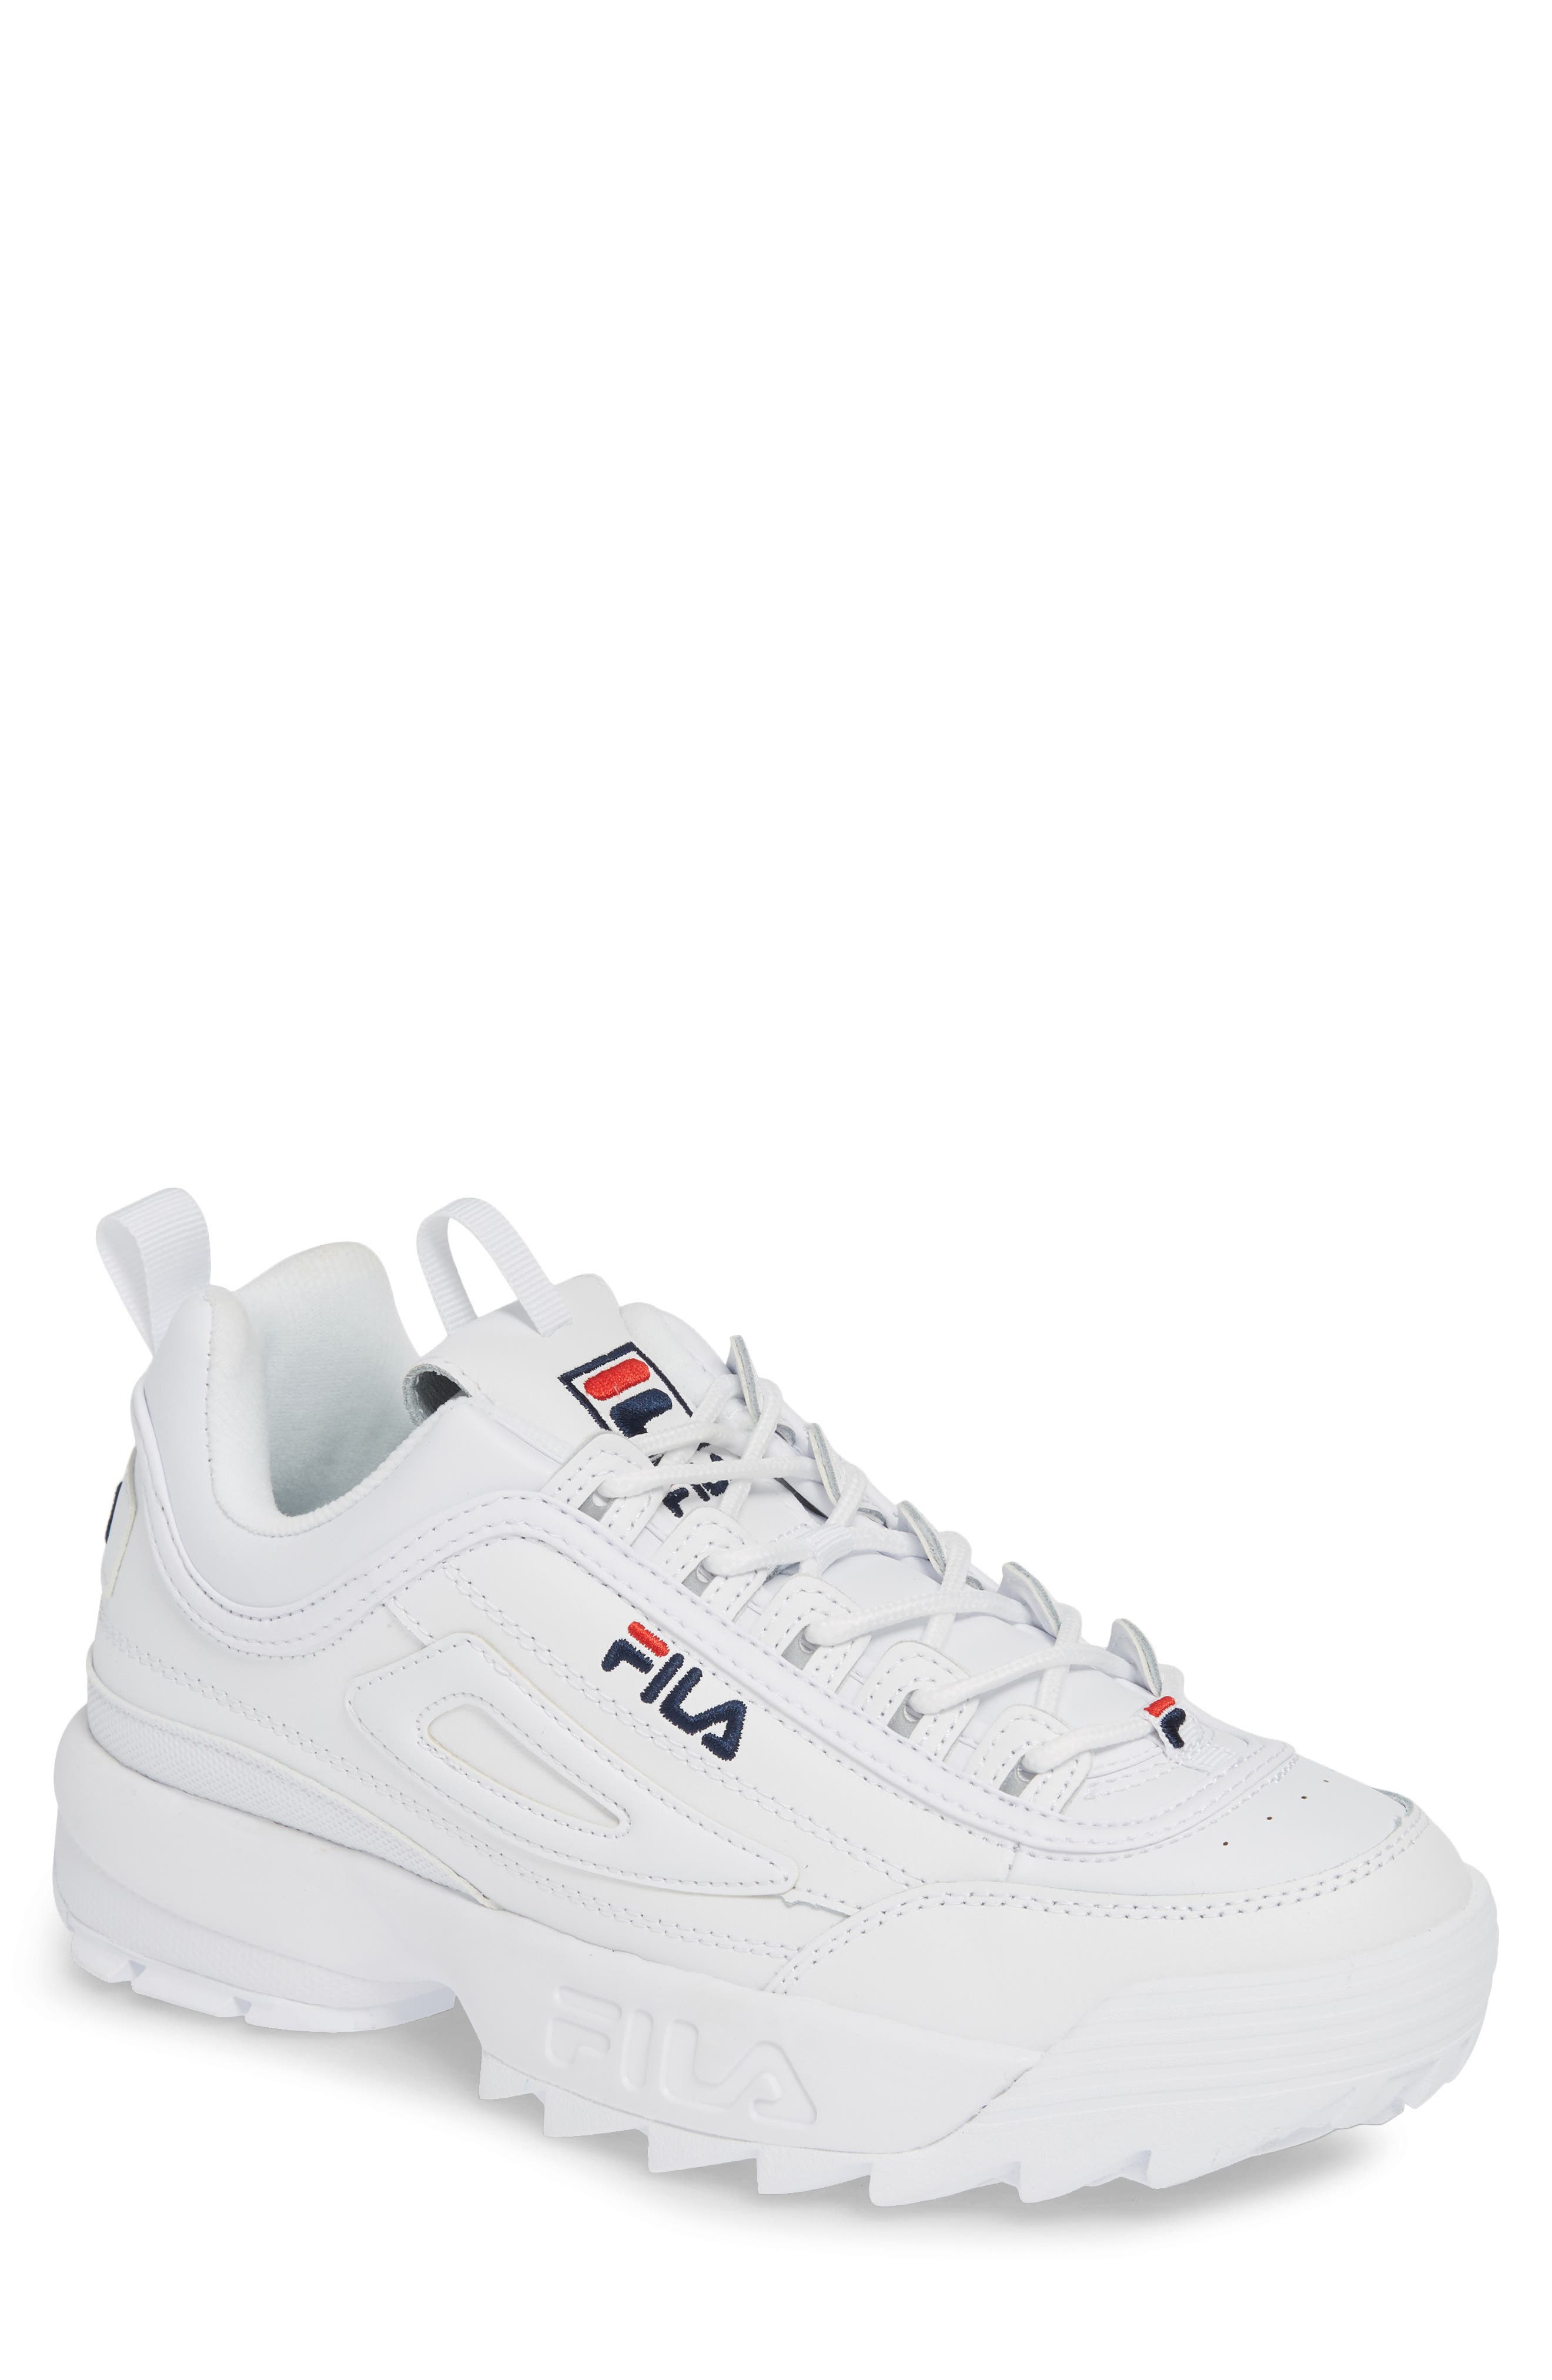 FILA Disruptor II Premium Sneaker, Main, color, WHITE/ NAVY/ RED